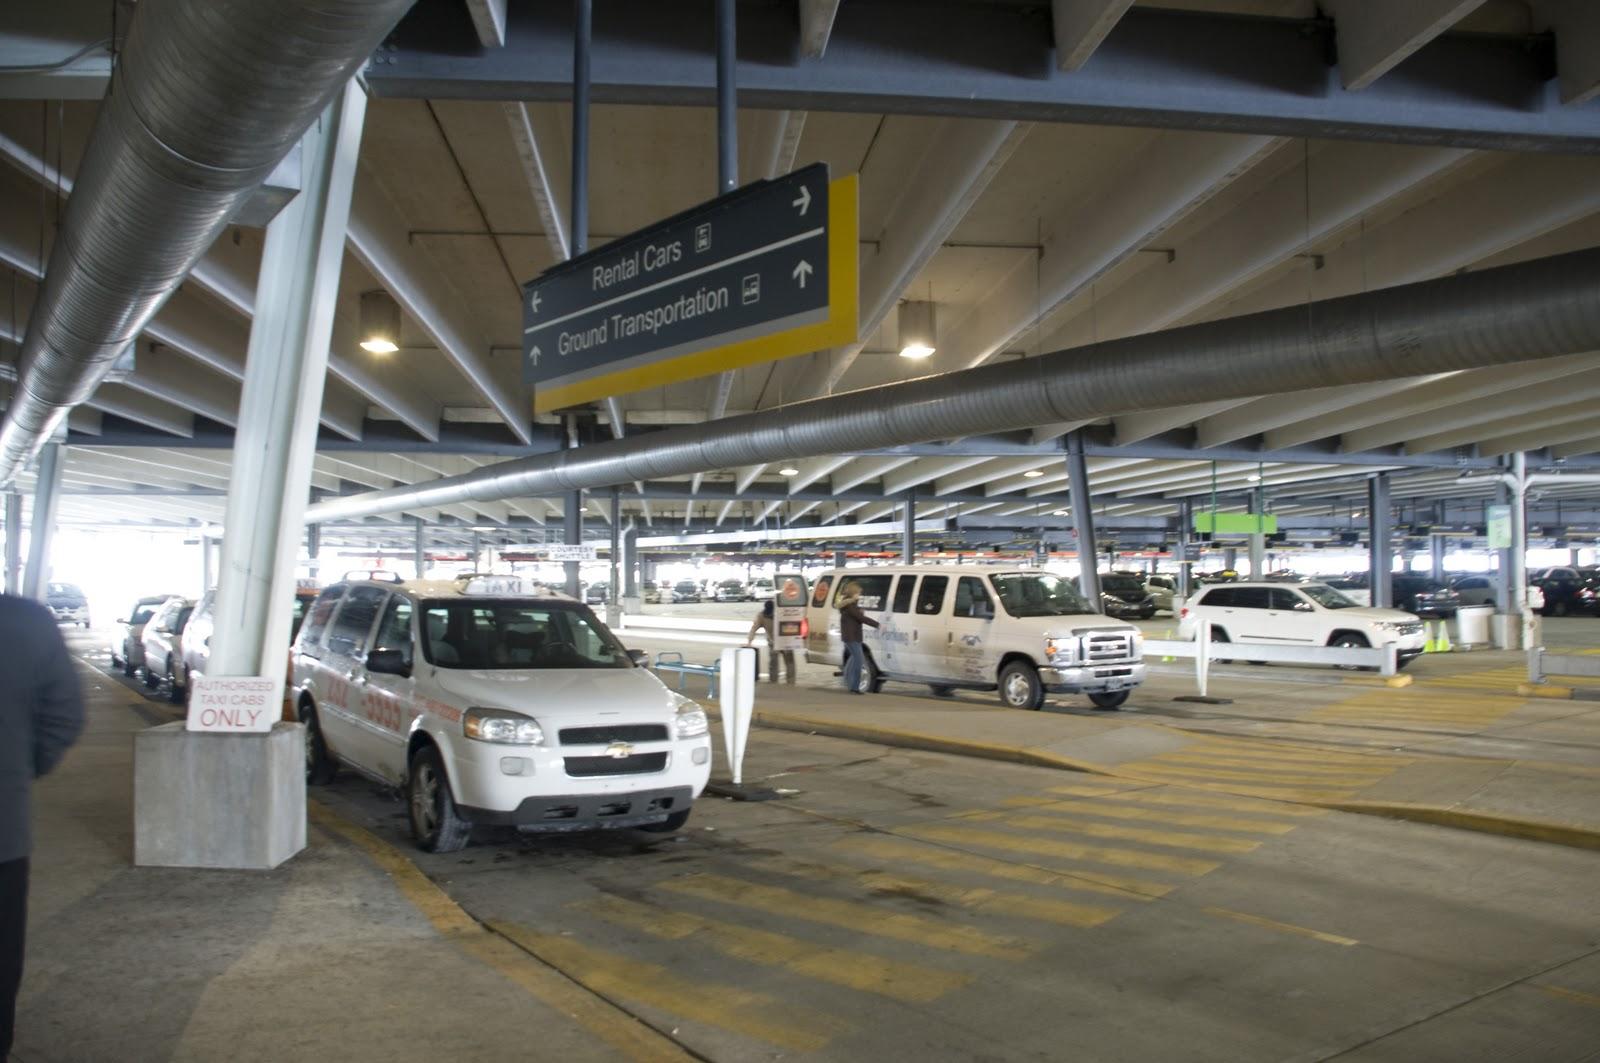 The Michaelist Mdt Harrisburg International Airport